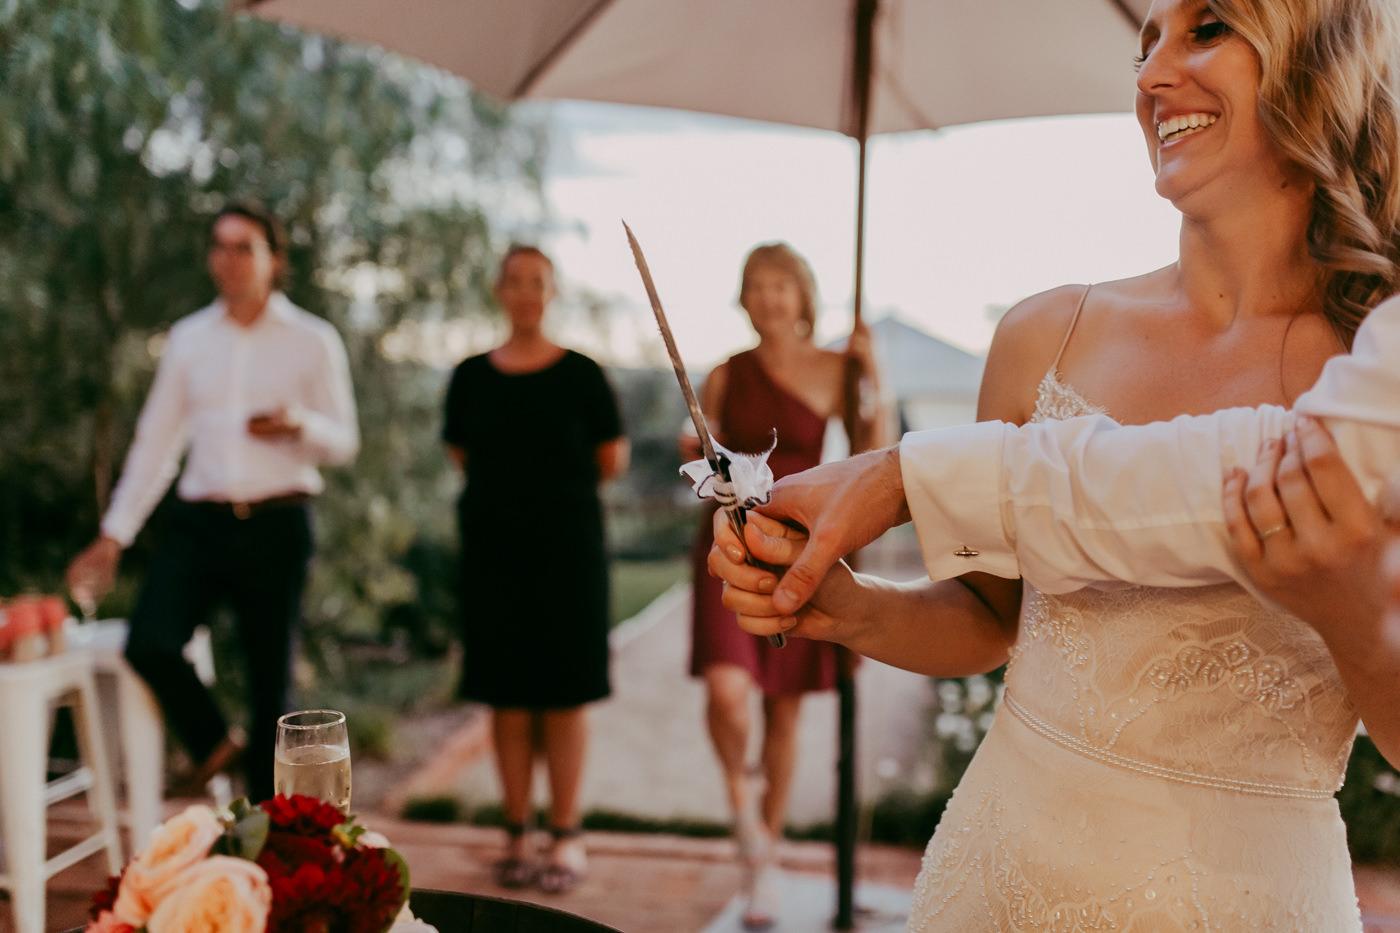 Anthony & Eliet - Wagga Wagga Wedding - Country NSW - Samantha Heather Photography-169.jpg